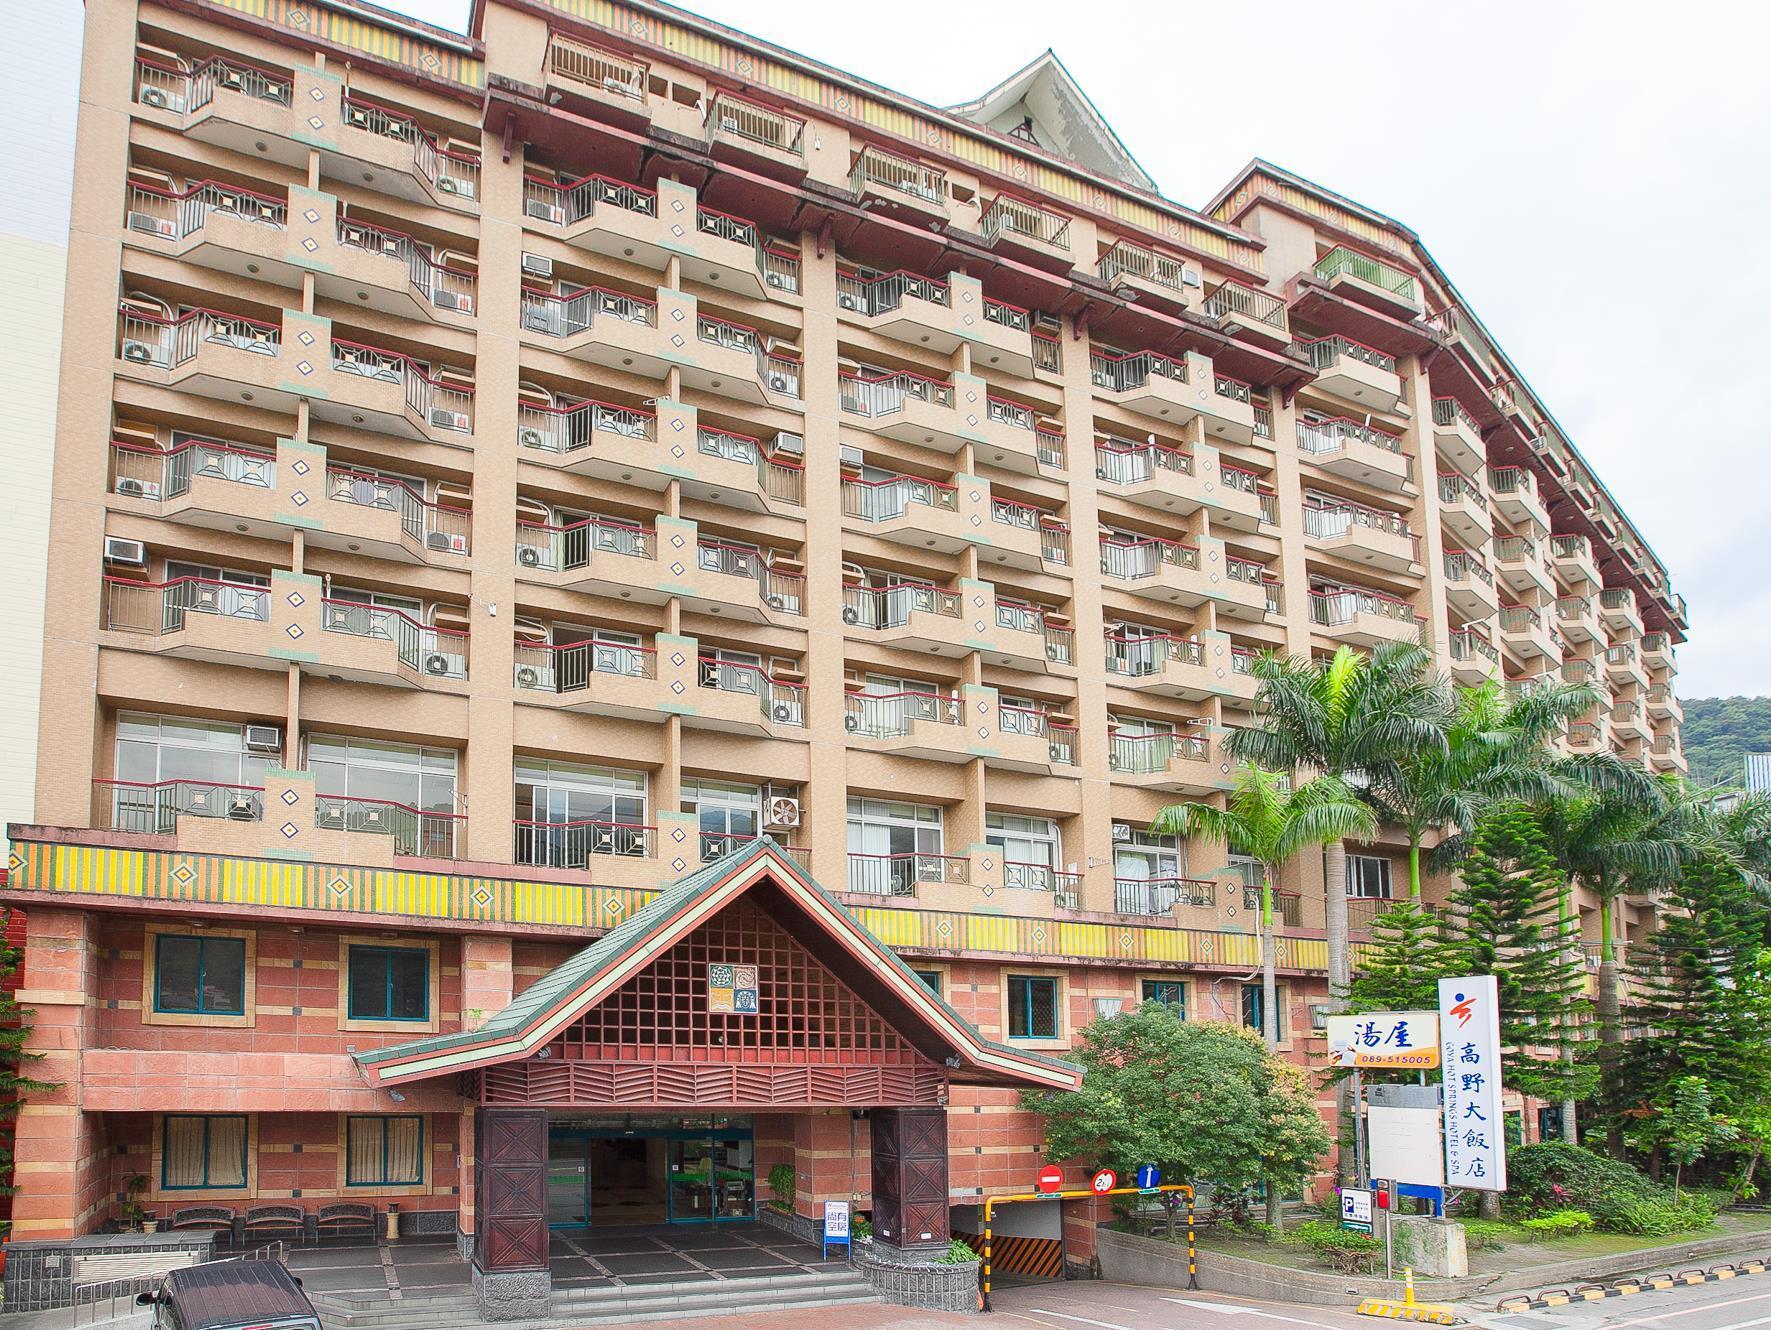 Goya Hot Springs Hotel And Spa